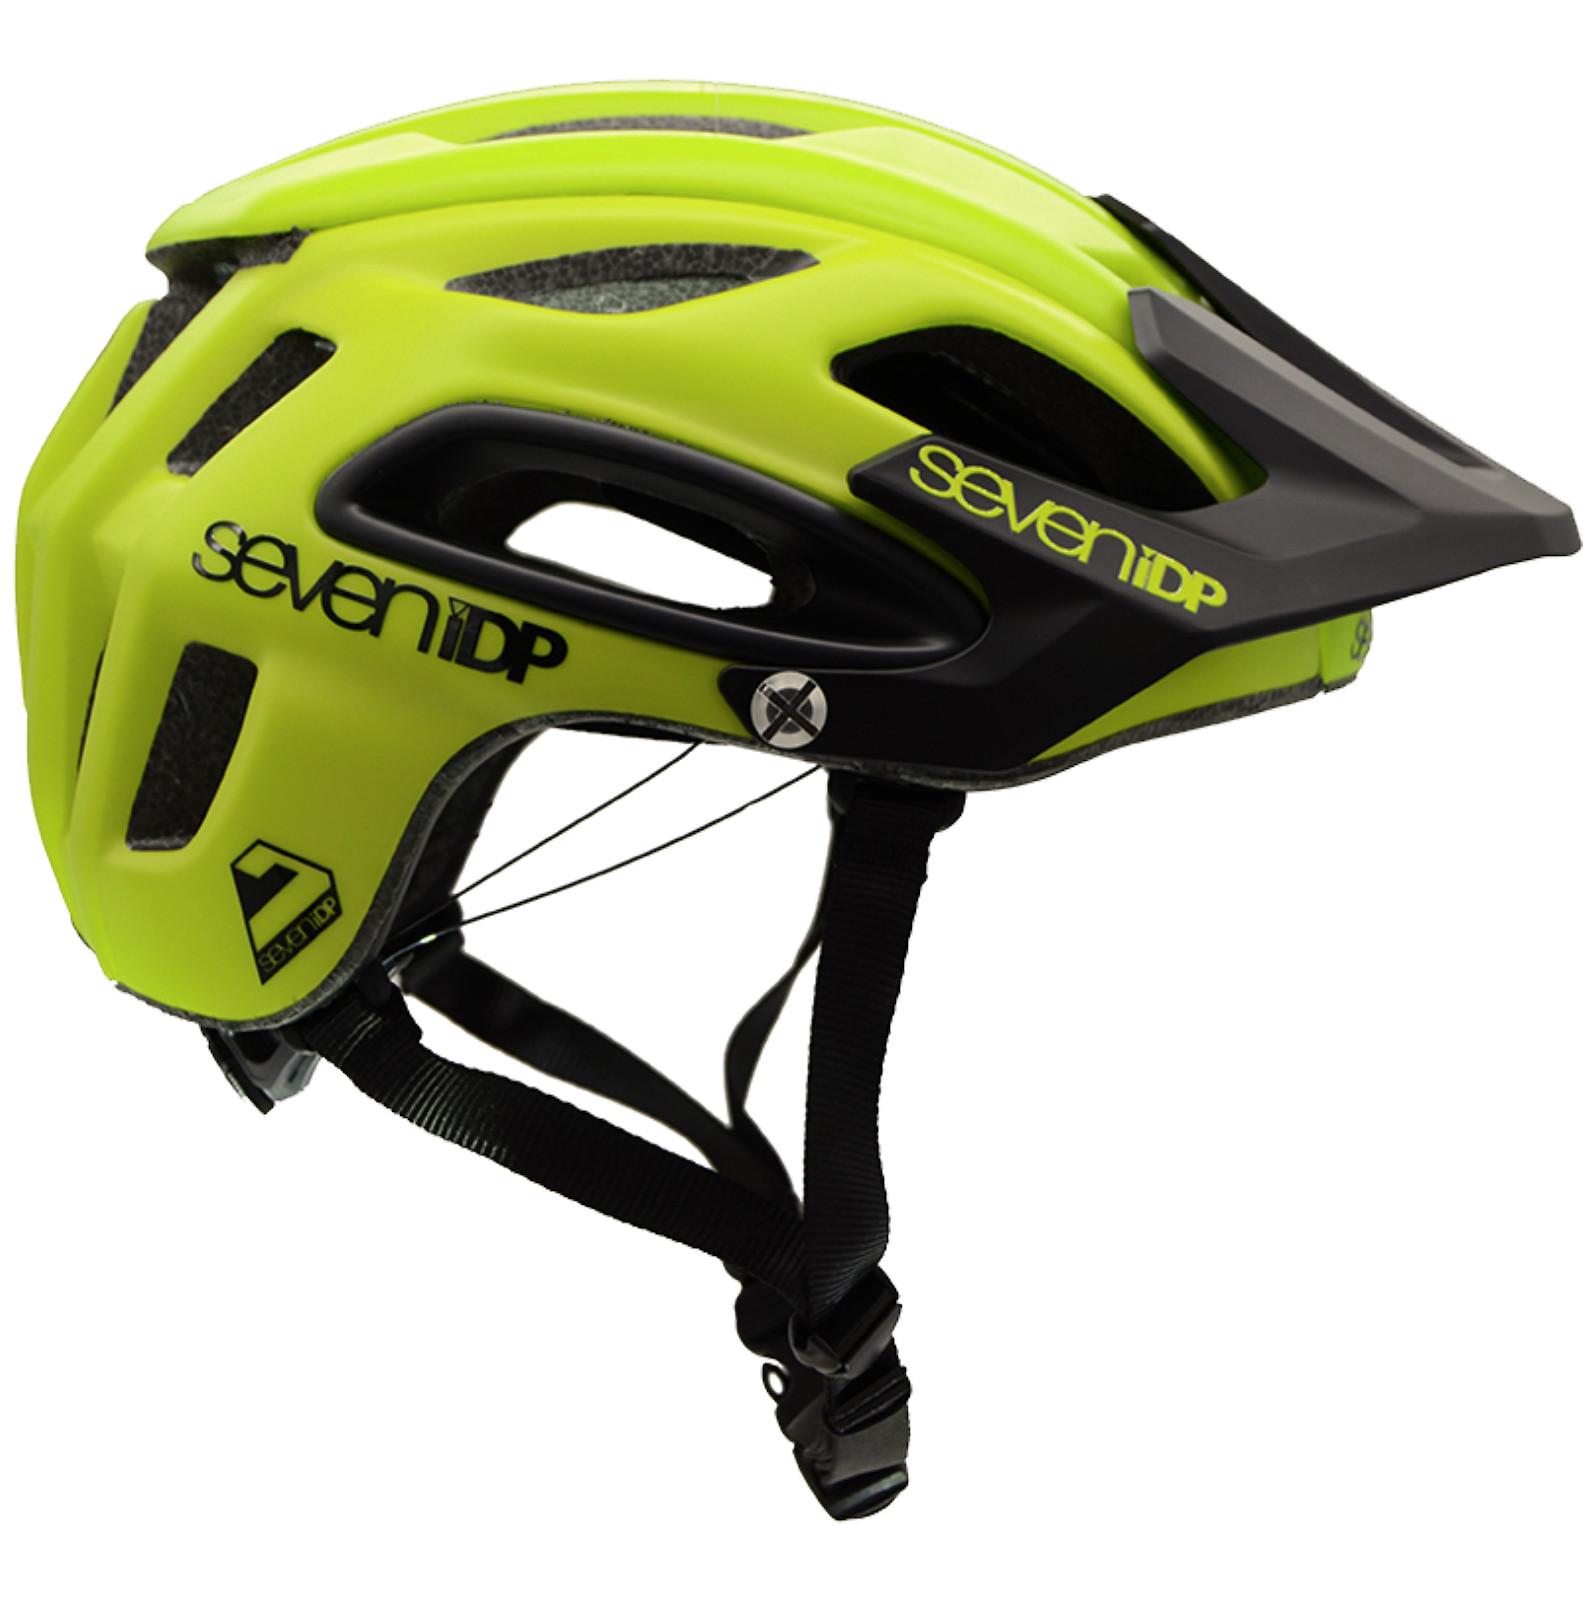 7iDP M2 Open Face Helmet - Acid Yellow/Black